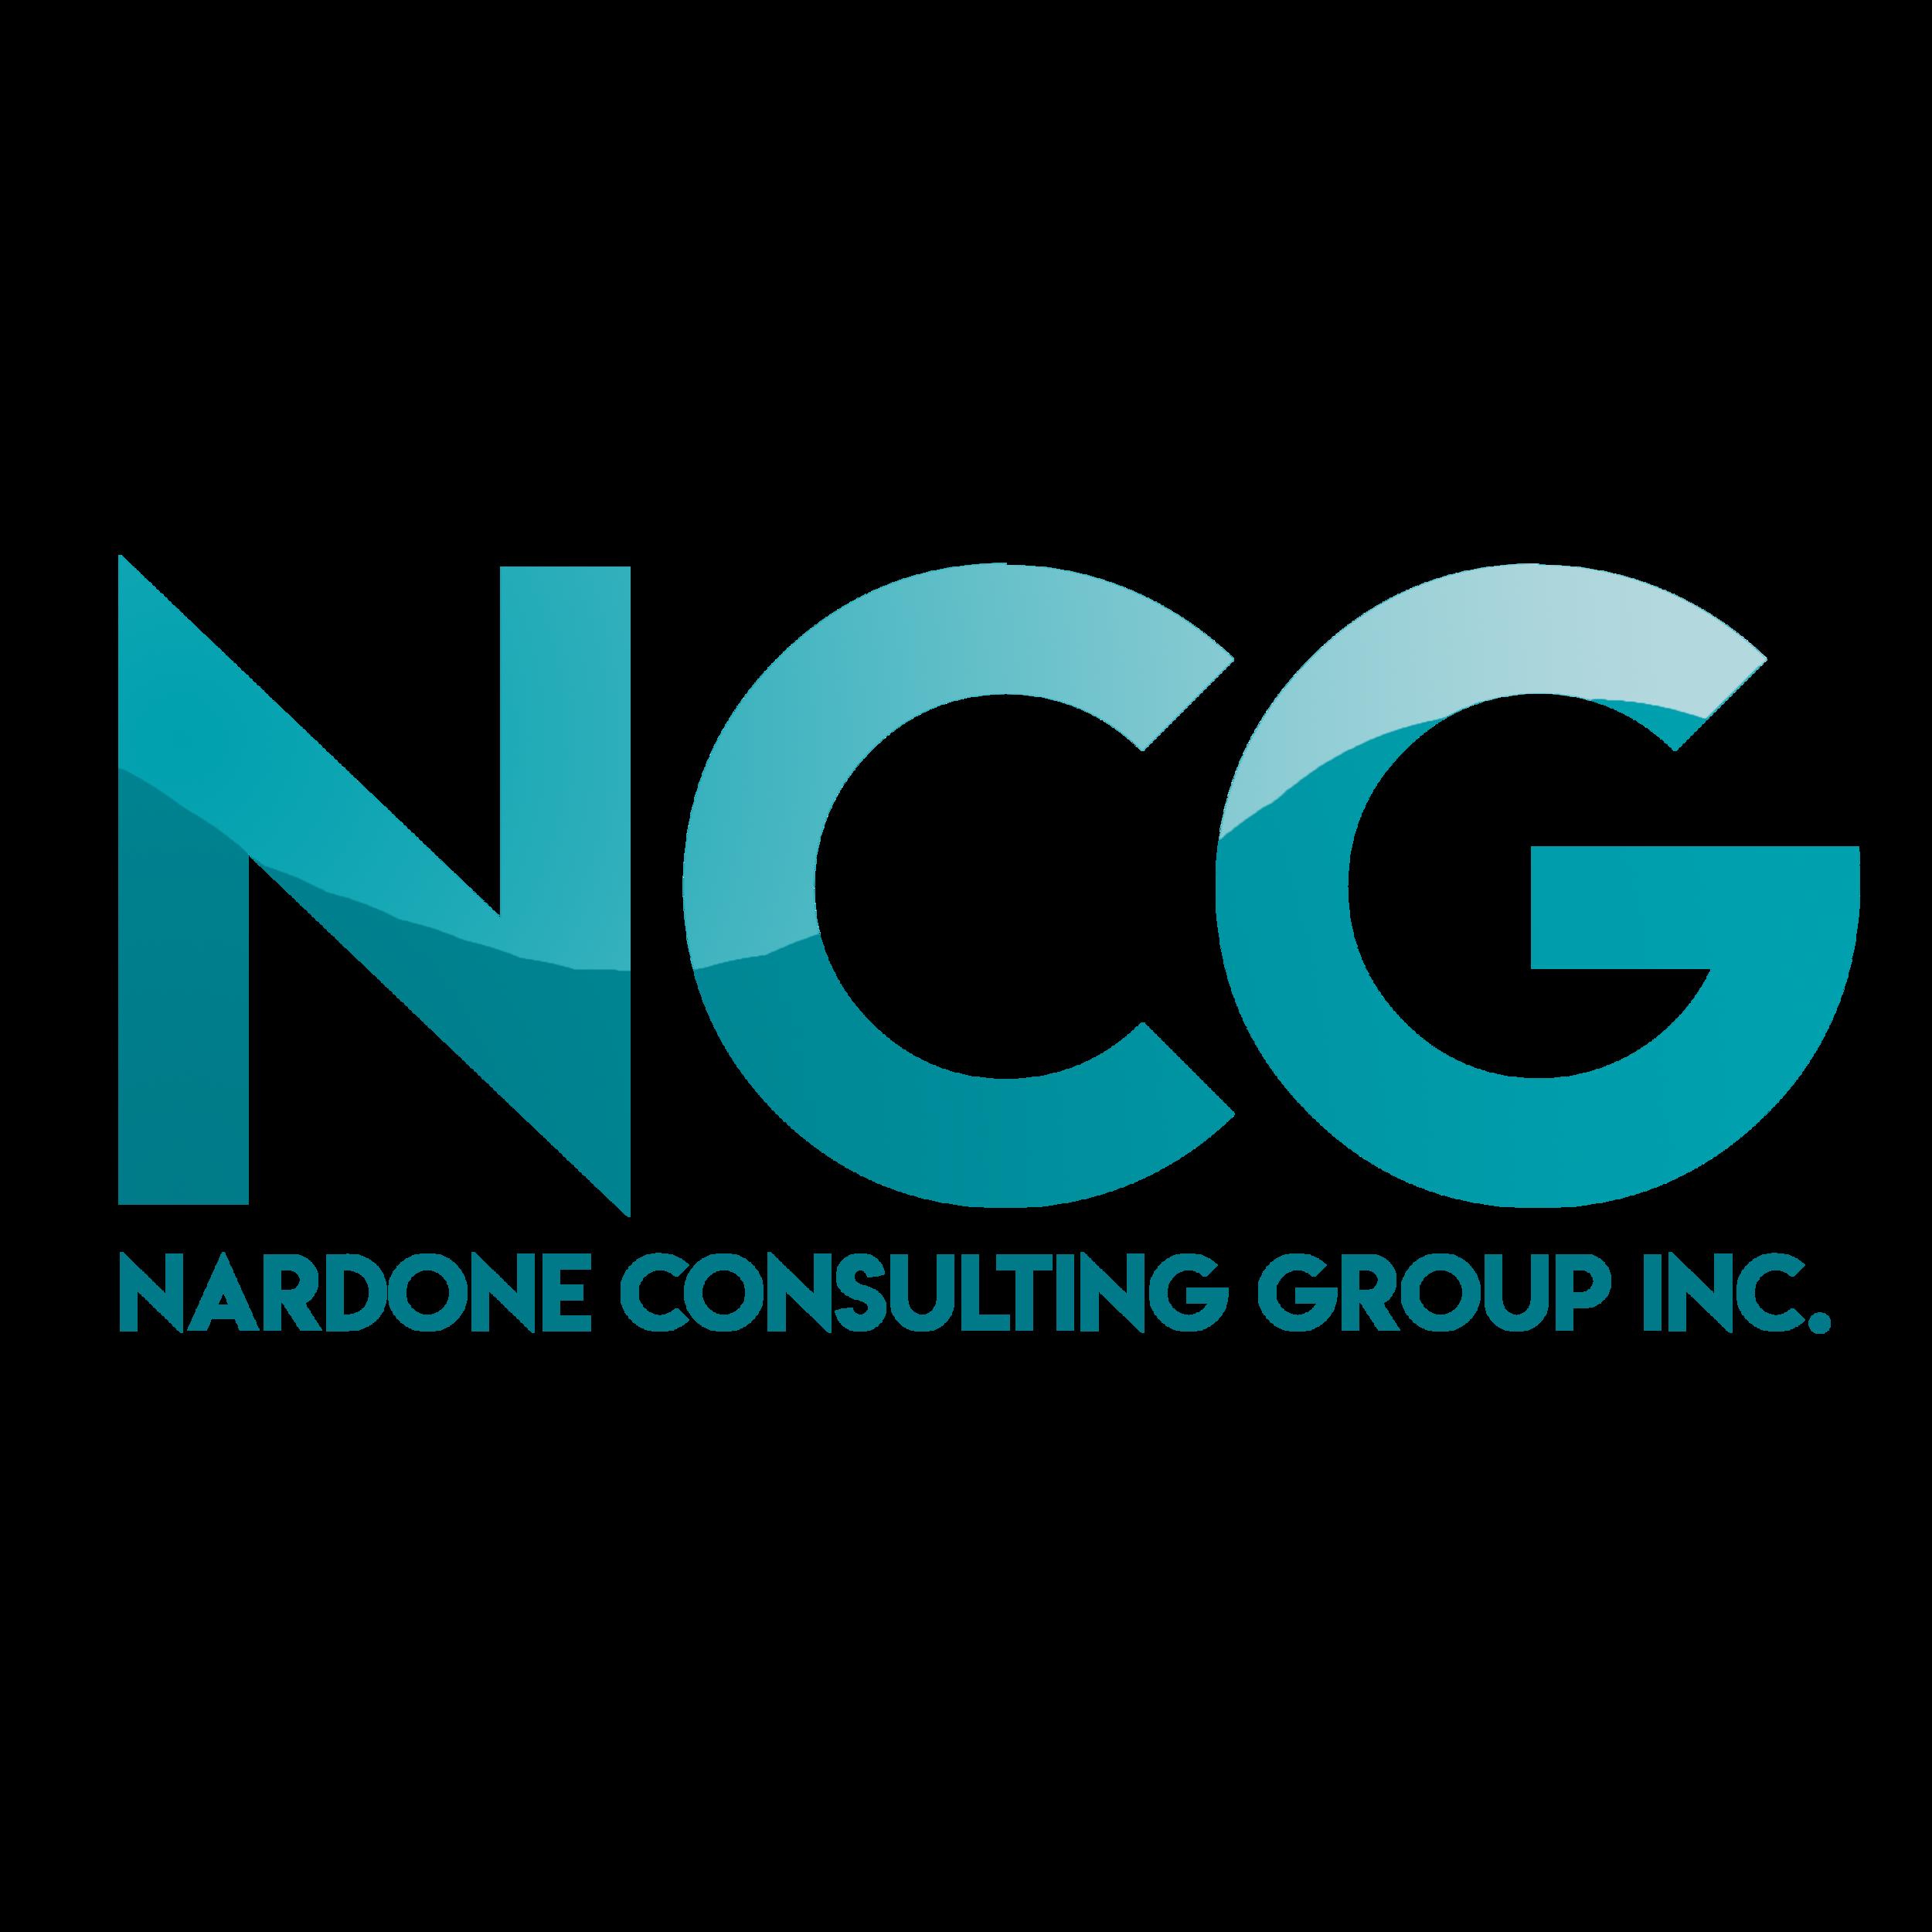 NCGLogoA1.png